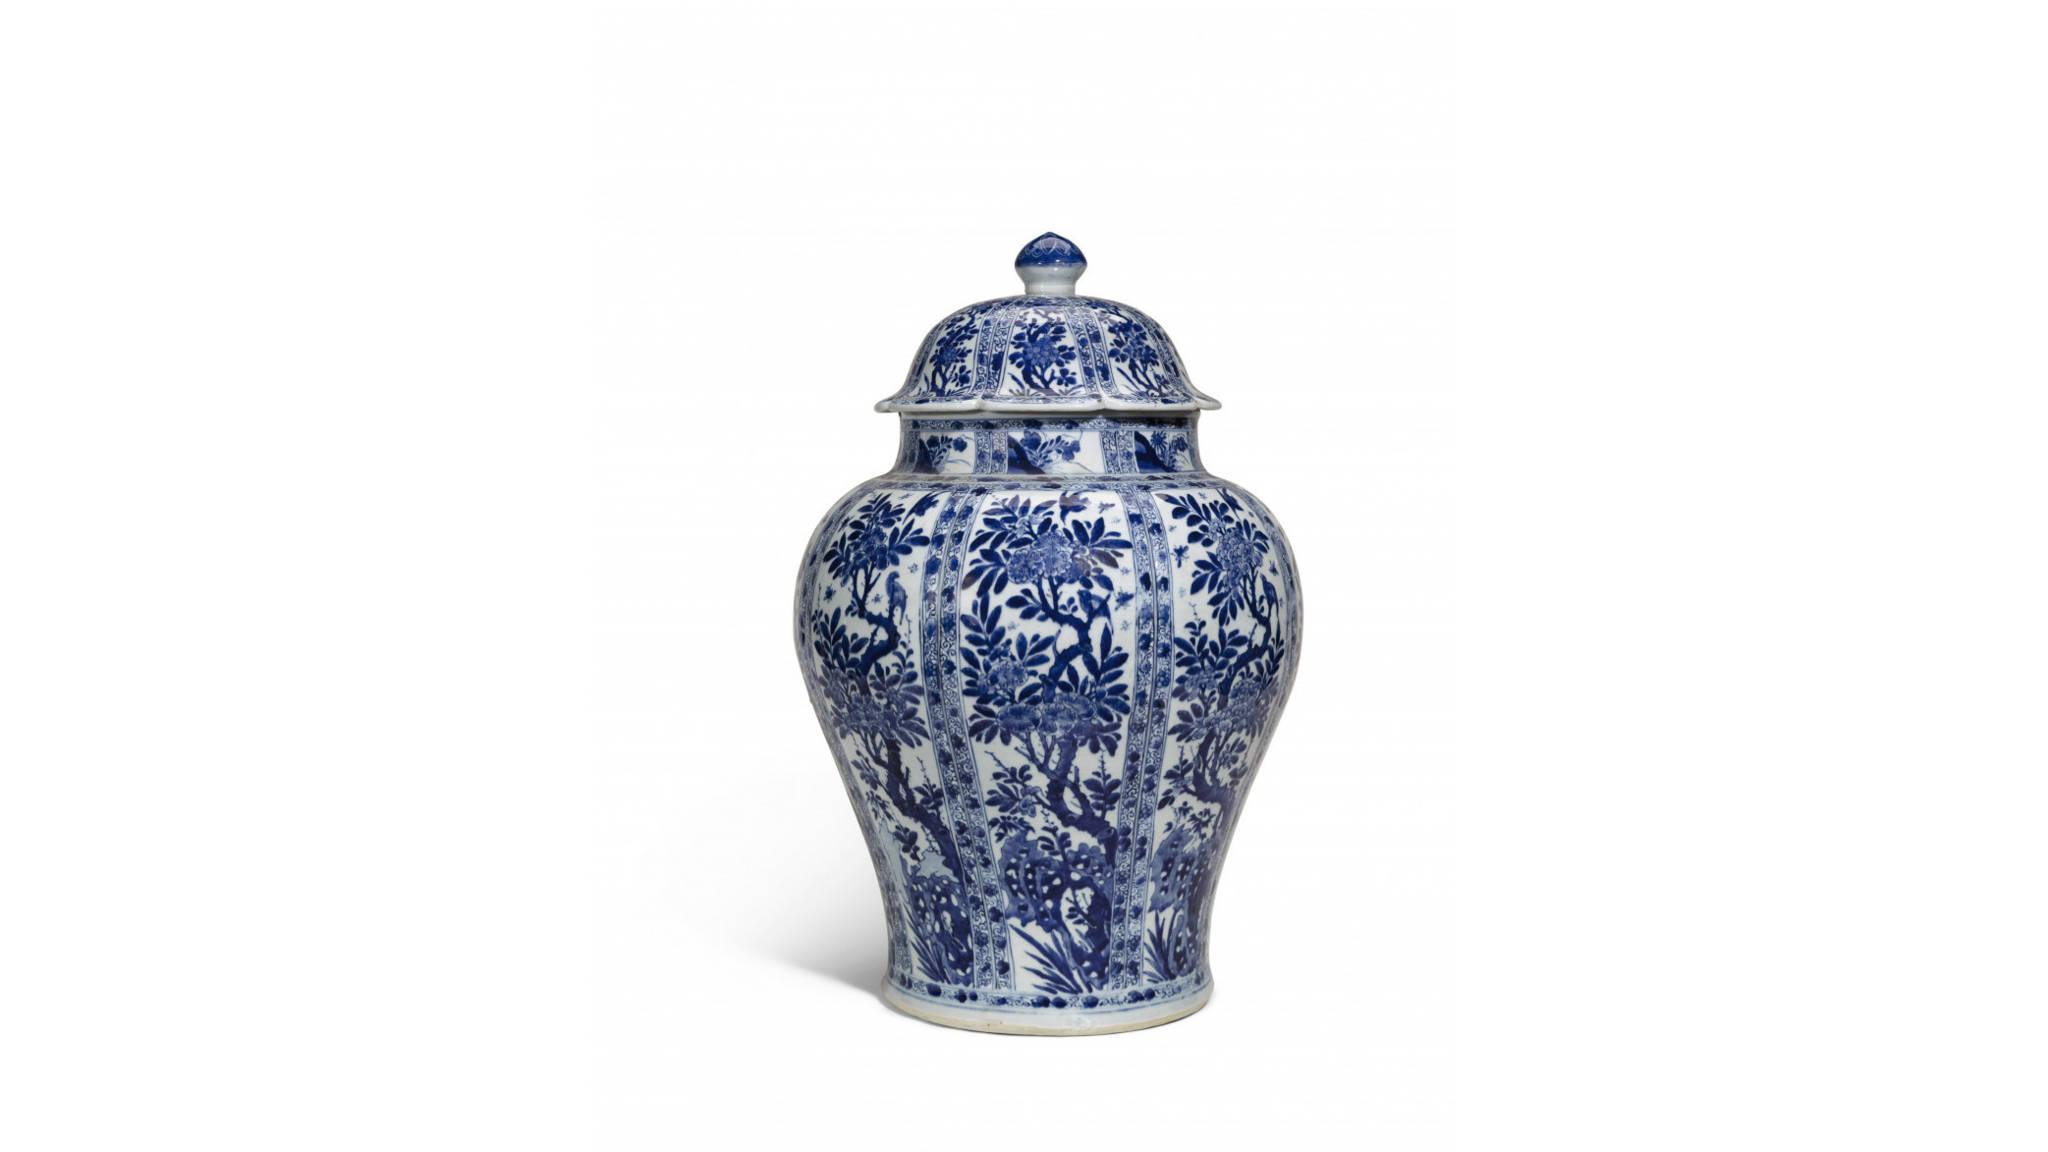 Antiek Chinees Porselein Herkennen.Serviesgoed Van Prinses Brengt Op Londense Veiling 30 000 Euro Op Nos